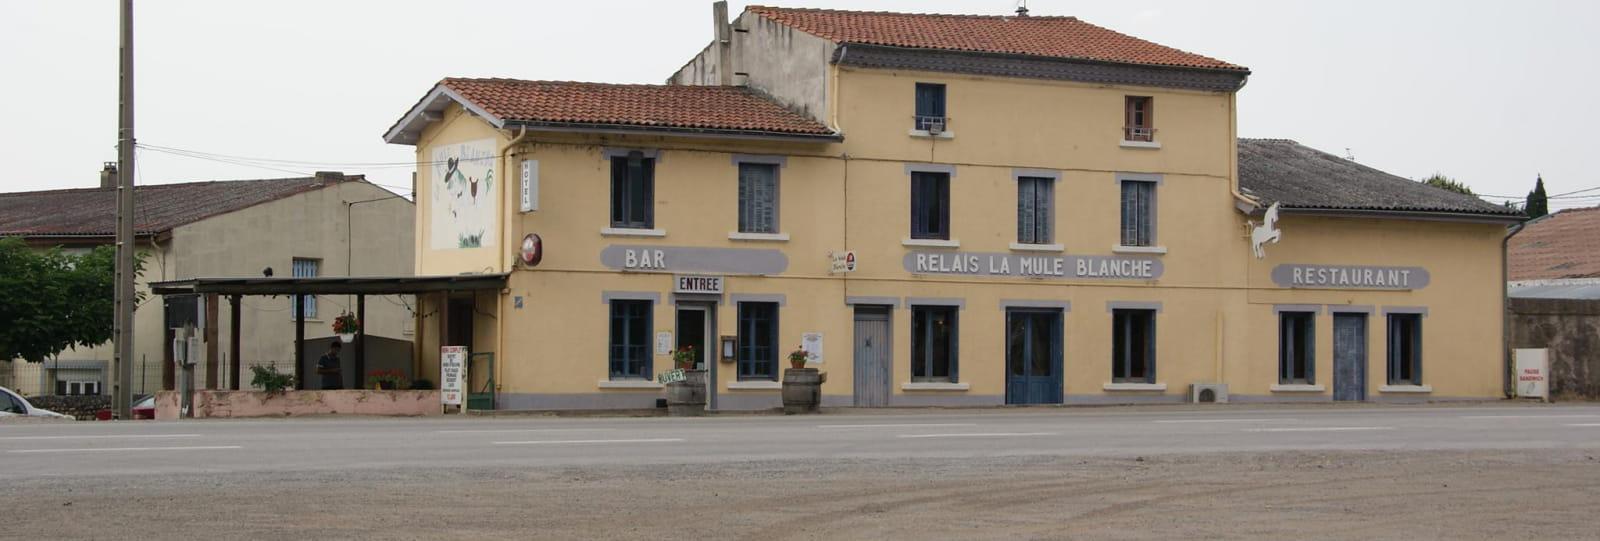 restaurant - relais routier